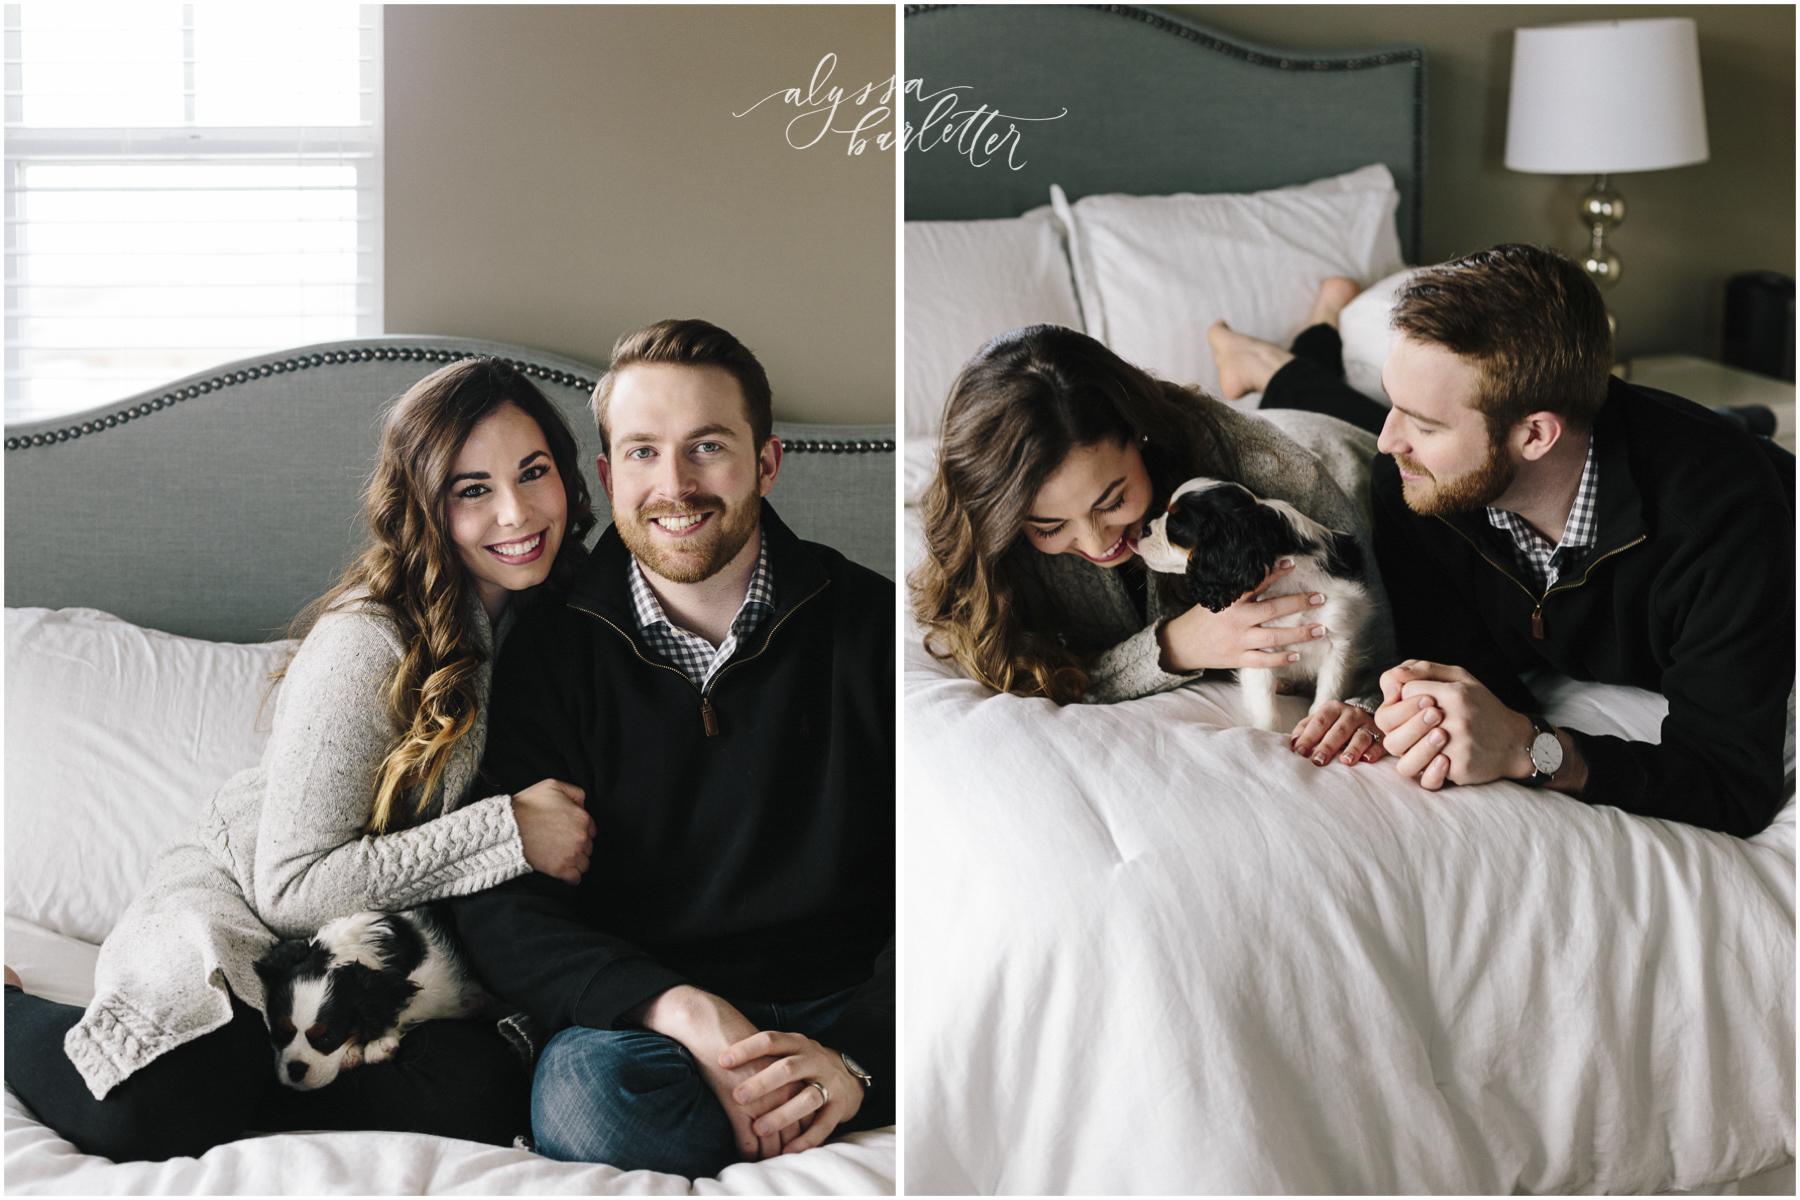 alyssa barletter photography lifestyle apartment new puppy-1-2.jpg